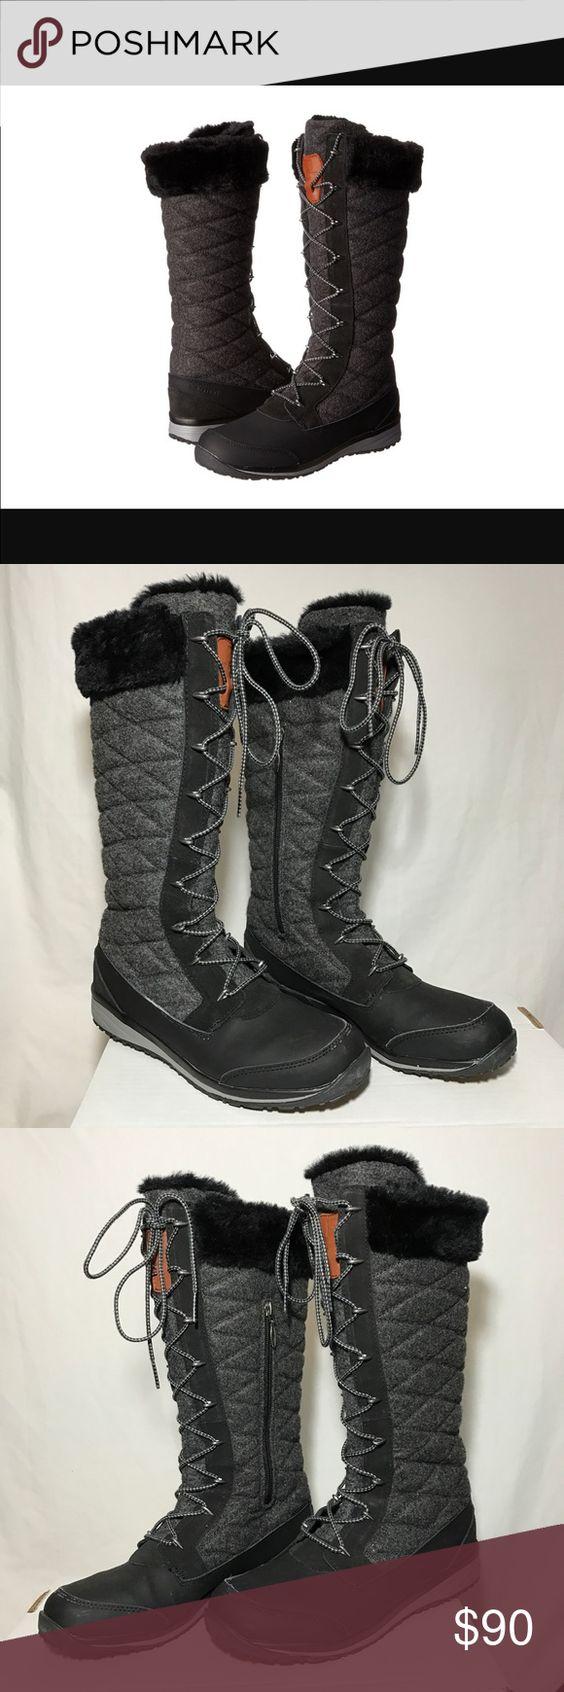 Salomon Hime High Snow Boots, Size 9